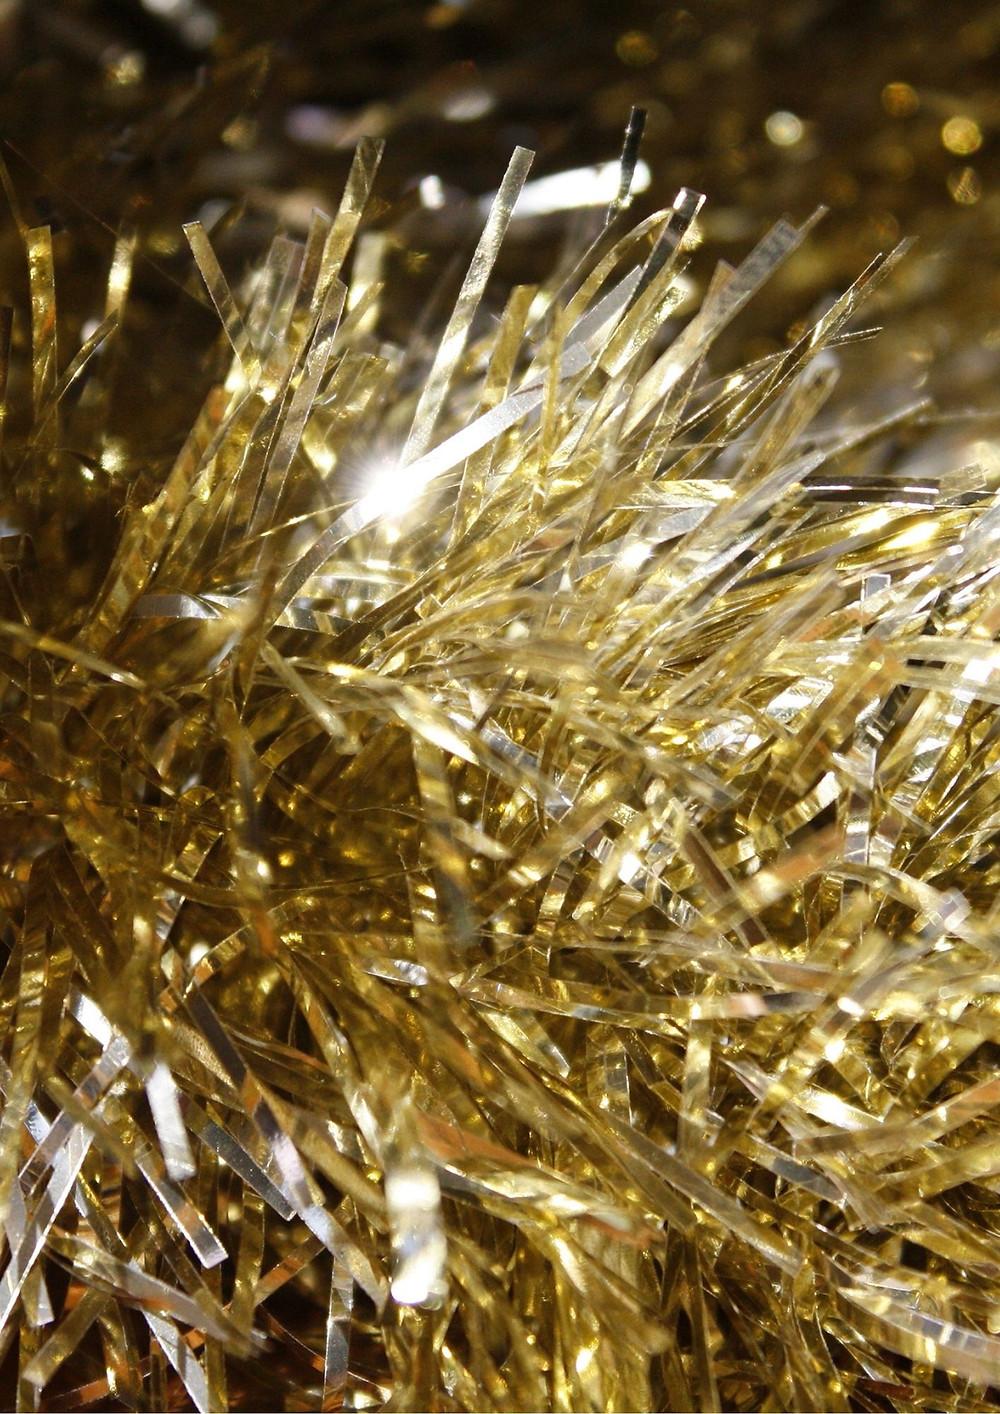 Gold festive tinsel